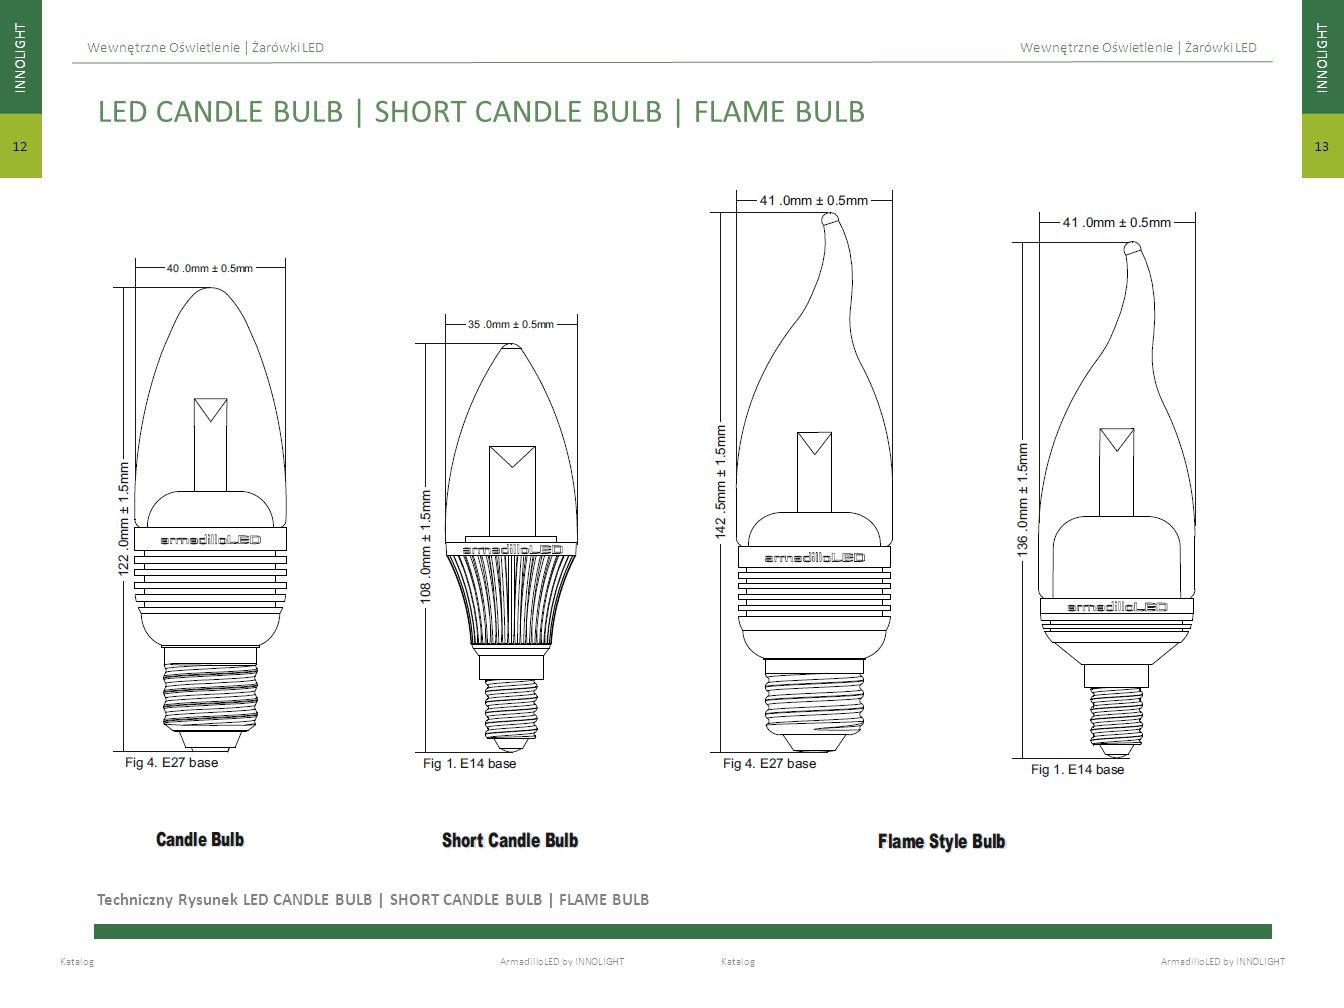 INNOLIGHT 13 INNOLIGHT 12 Katalog ArmadilloLED by INNOLIGHT Wewnętrzne Oświetlenie | Żarówki LED Techniczny Rysunek LED CANDLE BULB | SHORT CANDLE BUL